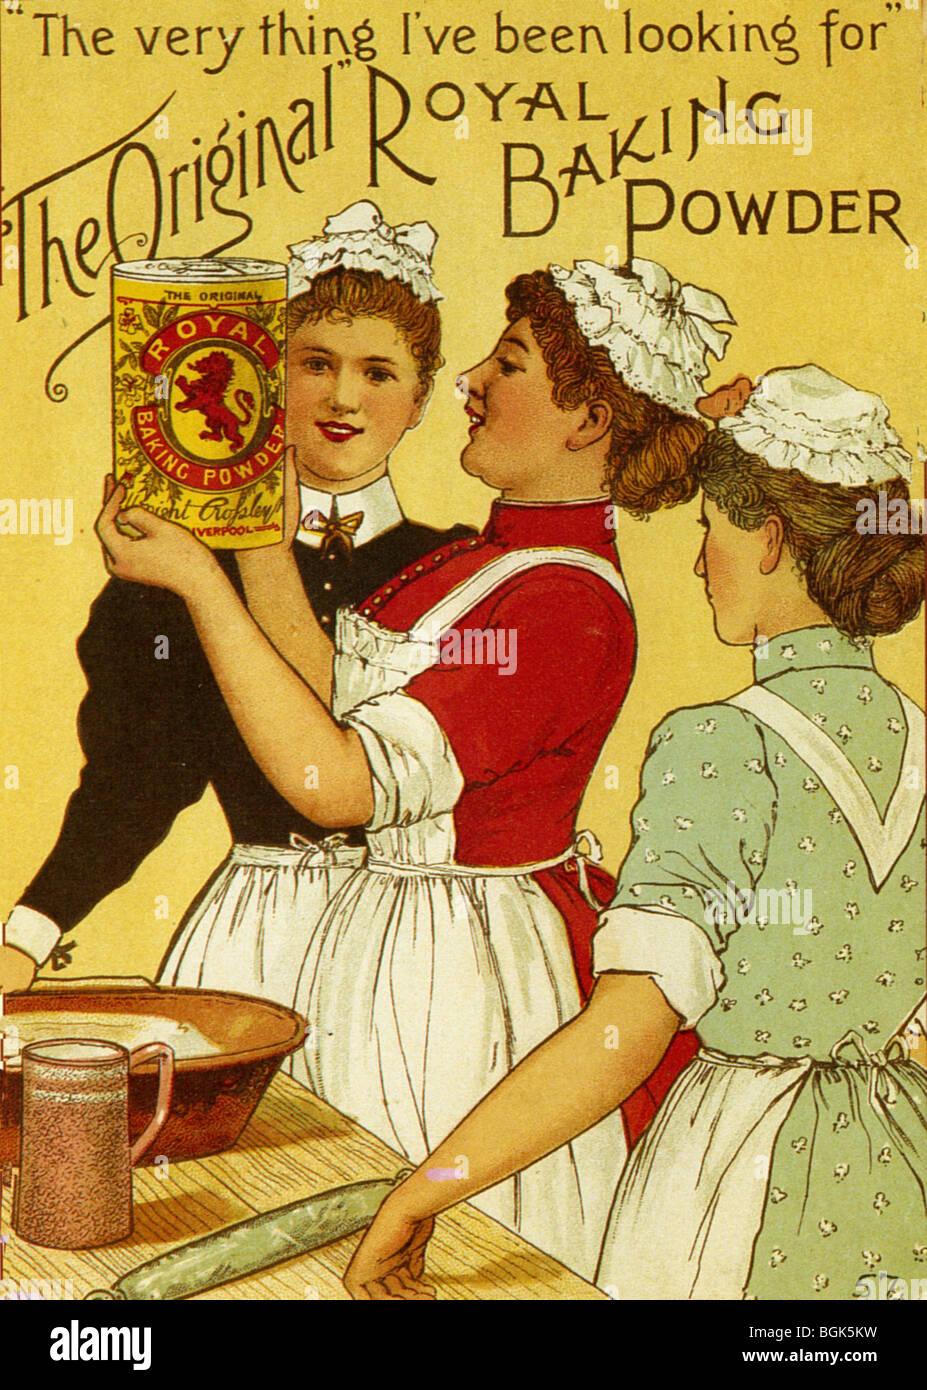 ROYAL Baking Powder anuncio acerca de 1895 Imagen De Stock